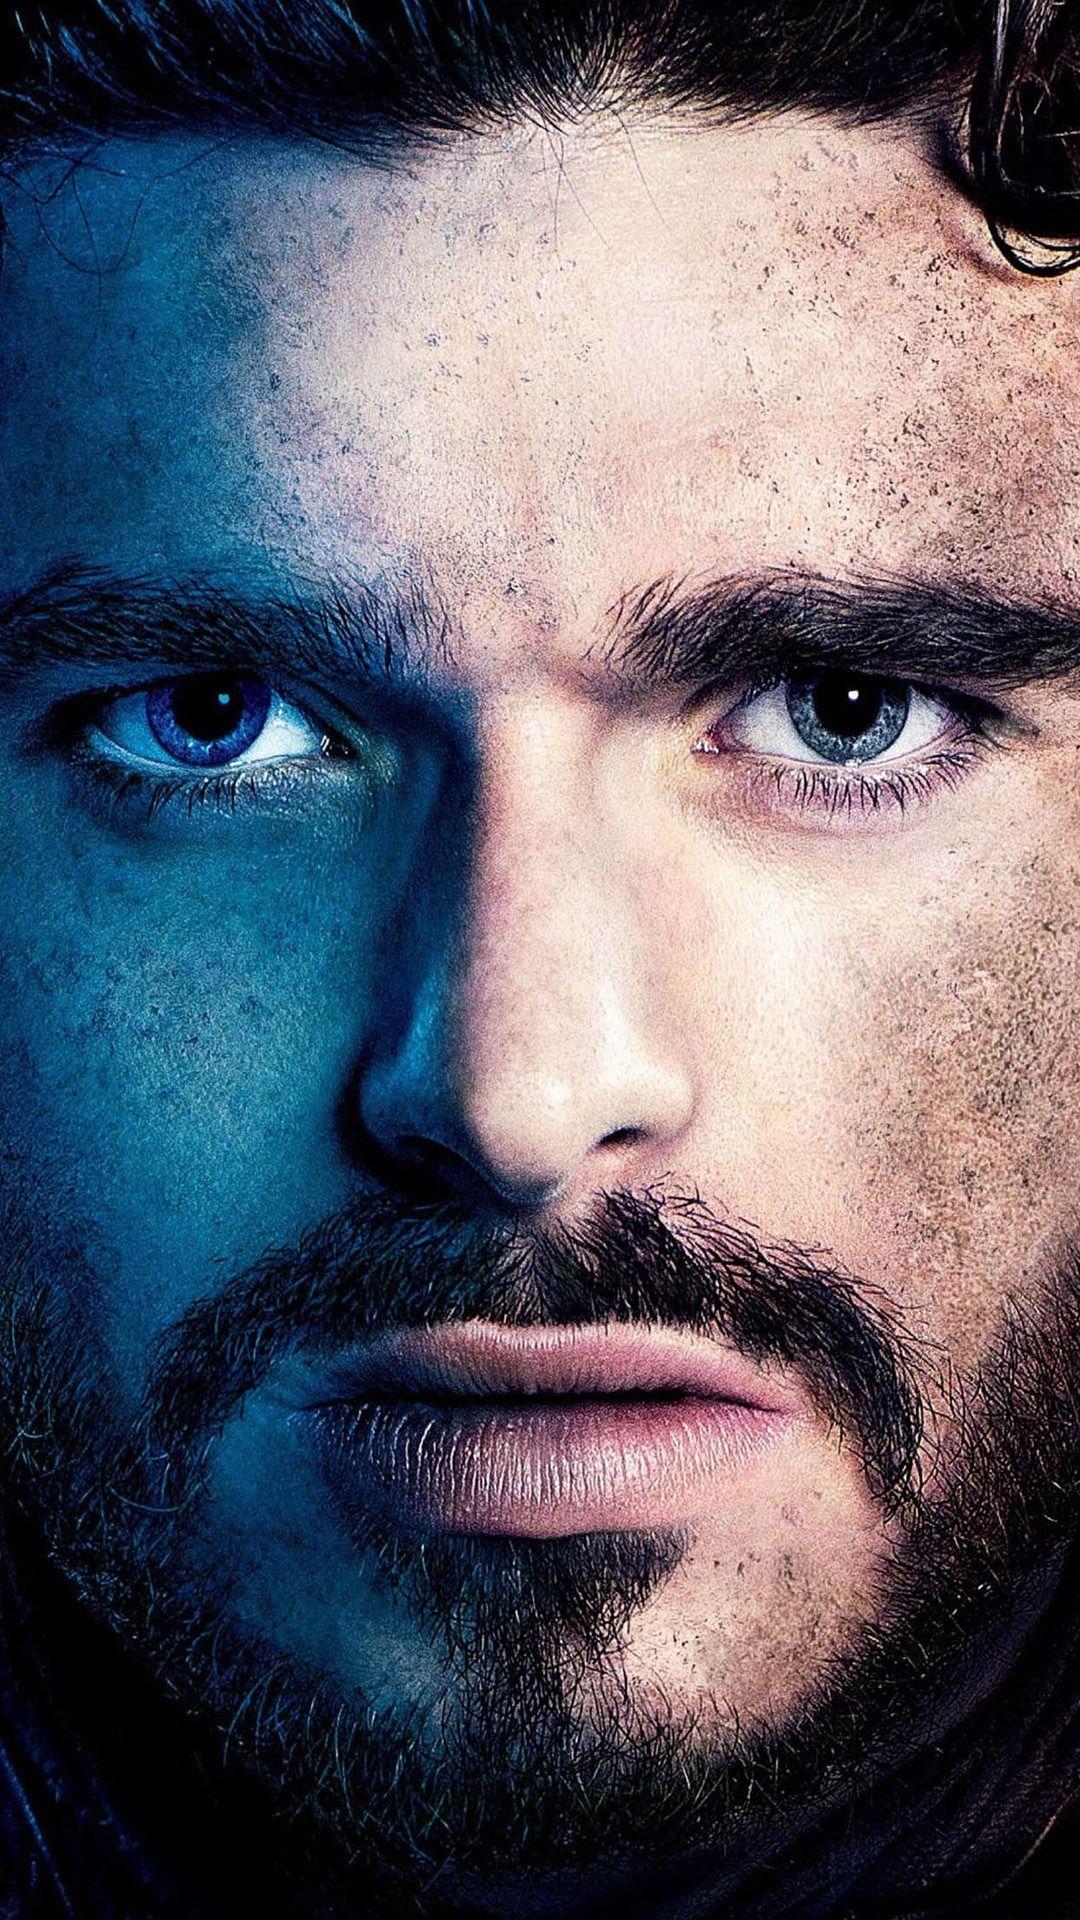 Jon Snow Hd Wallpaper For Mobile , HD Wallpaper & Backgrounds